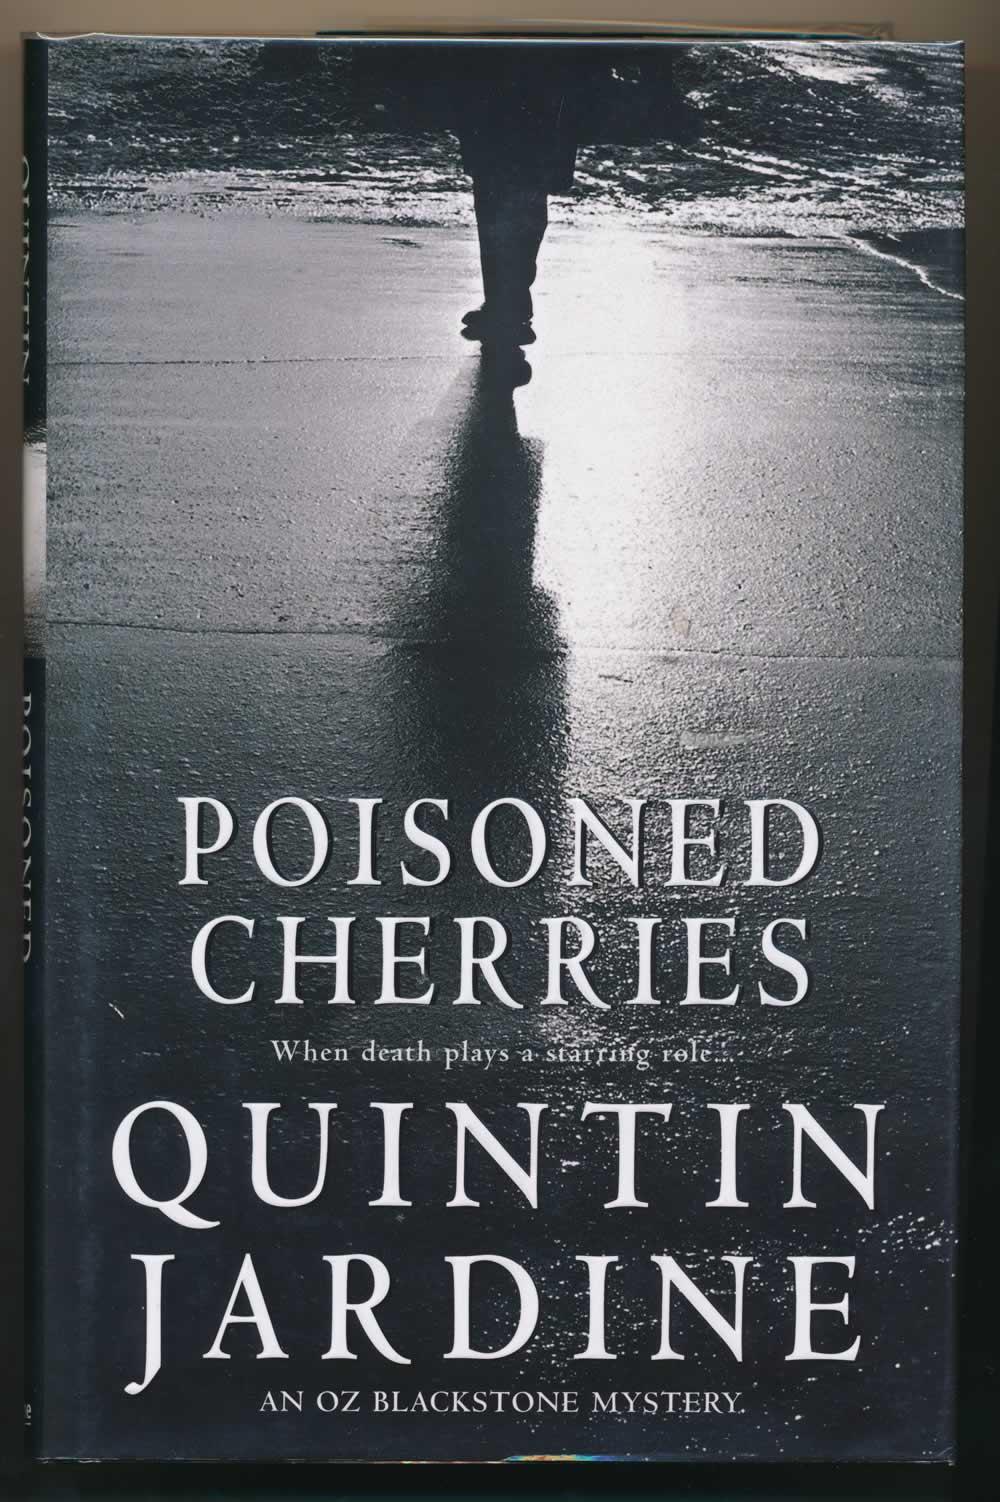 Poisoned cherries